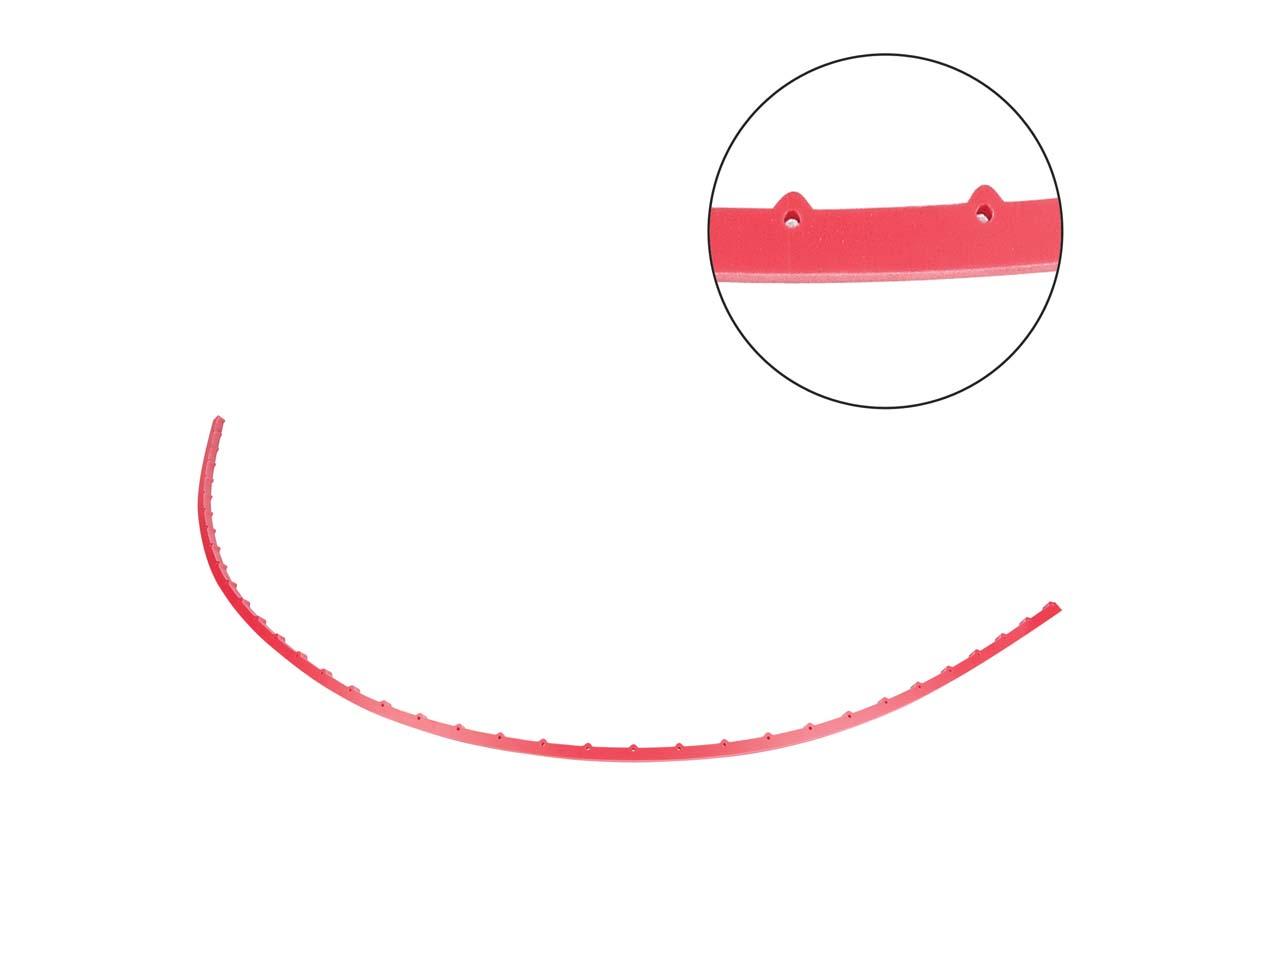 trend curv 8x1000 mini flexible curve guide 8mm x 1000mm